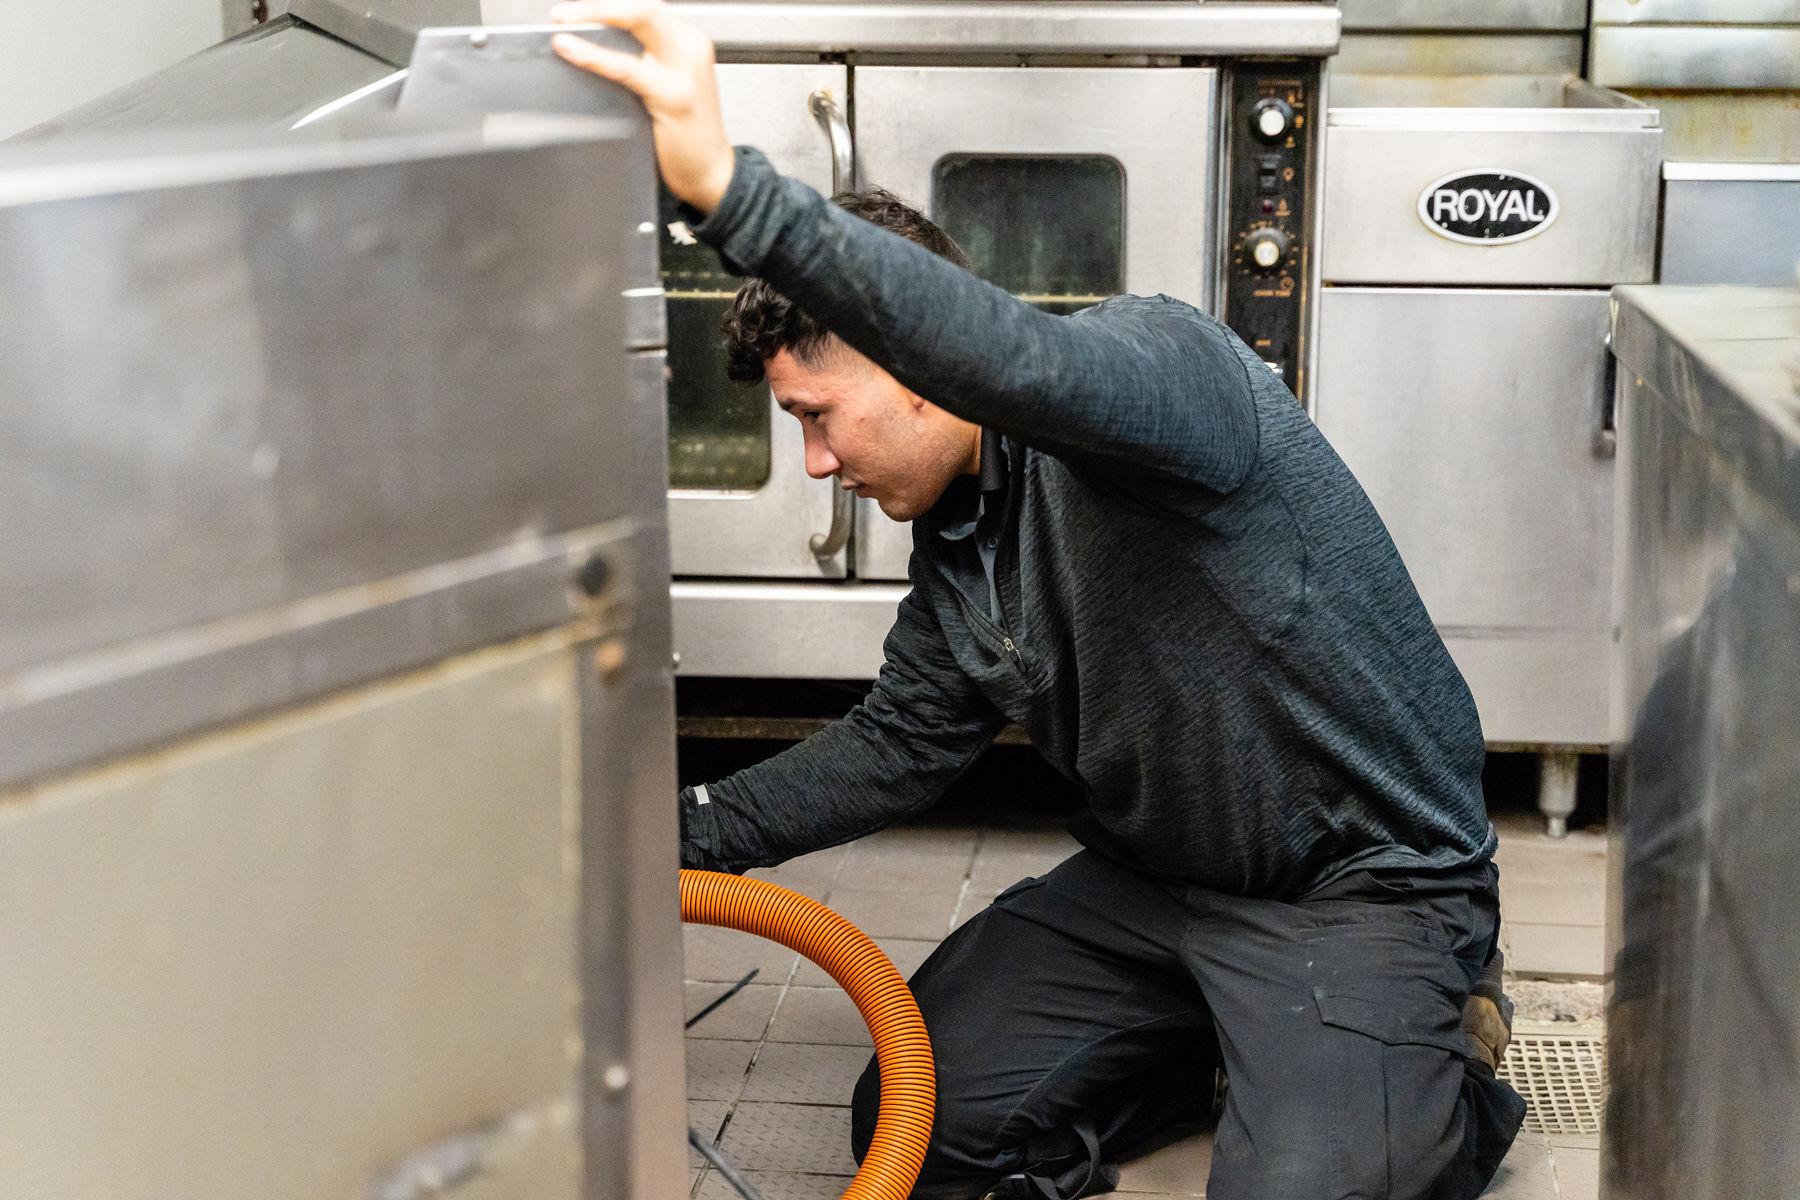 Alpha Omega Restaurant Equipment Repair Offers Warranties